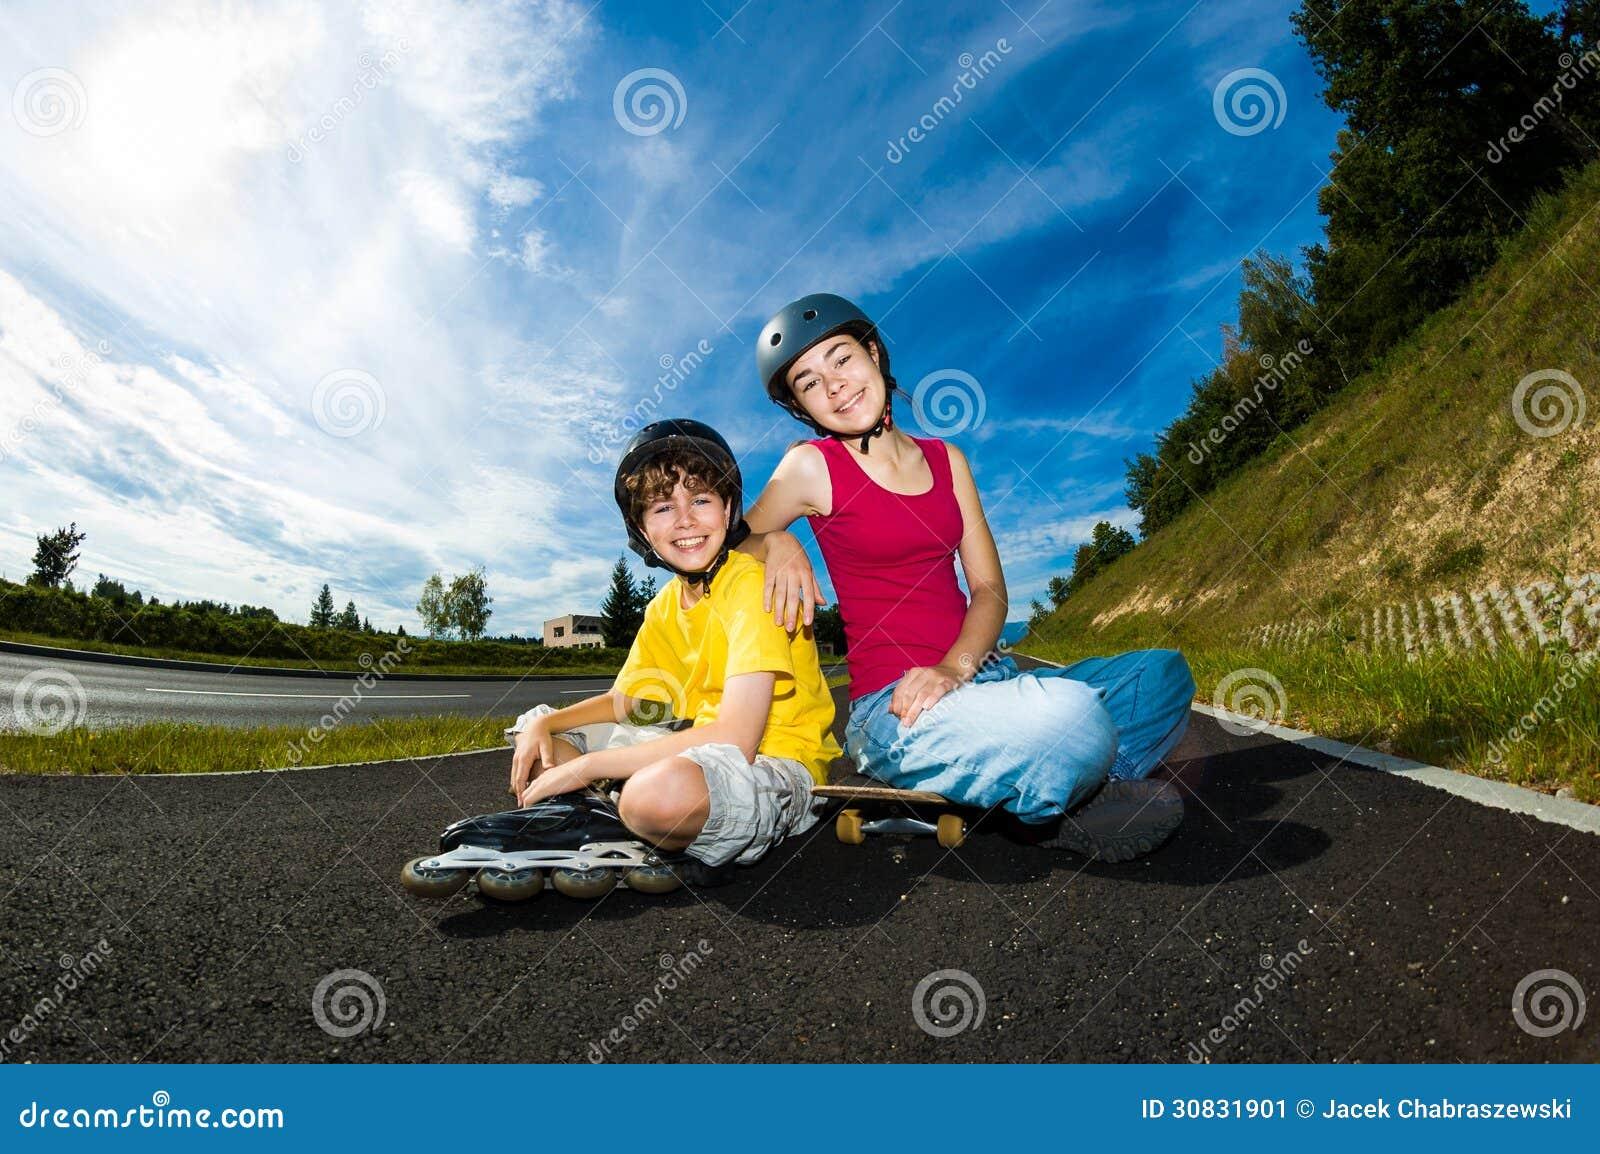 Giovani attivi - rollerblading, pattinante